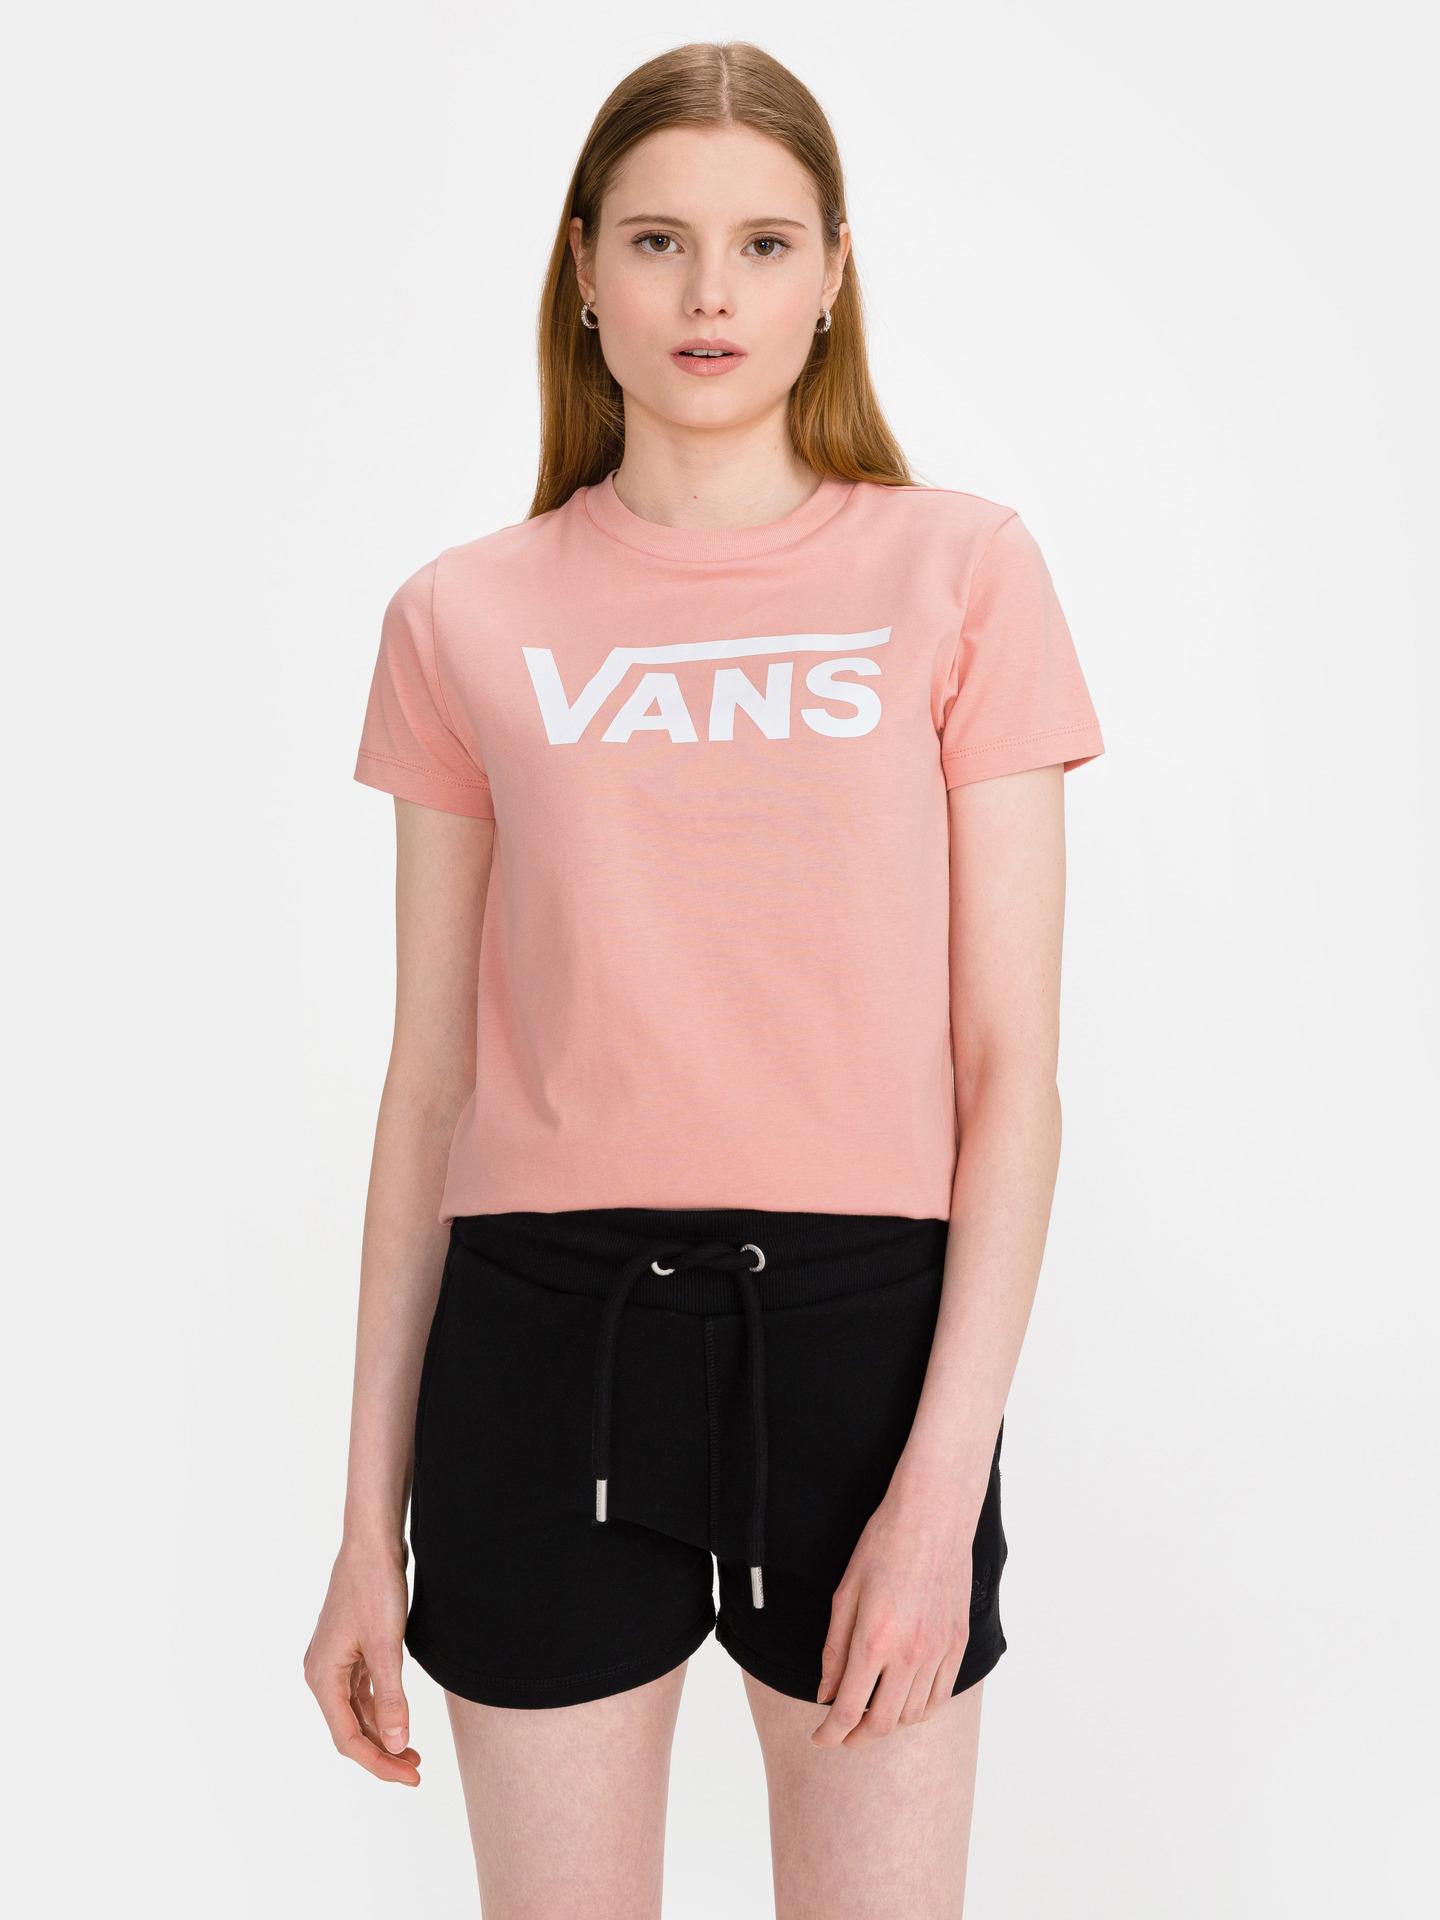 Vans růžové tričko Flying V